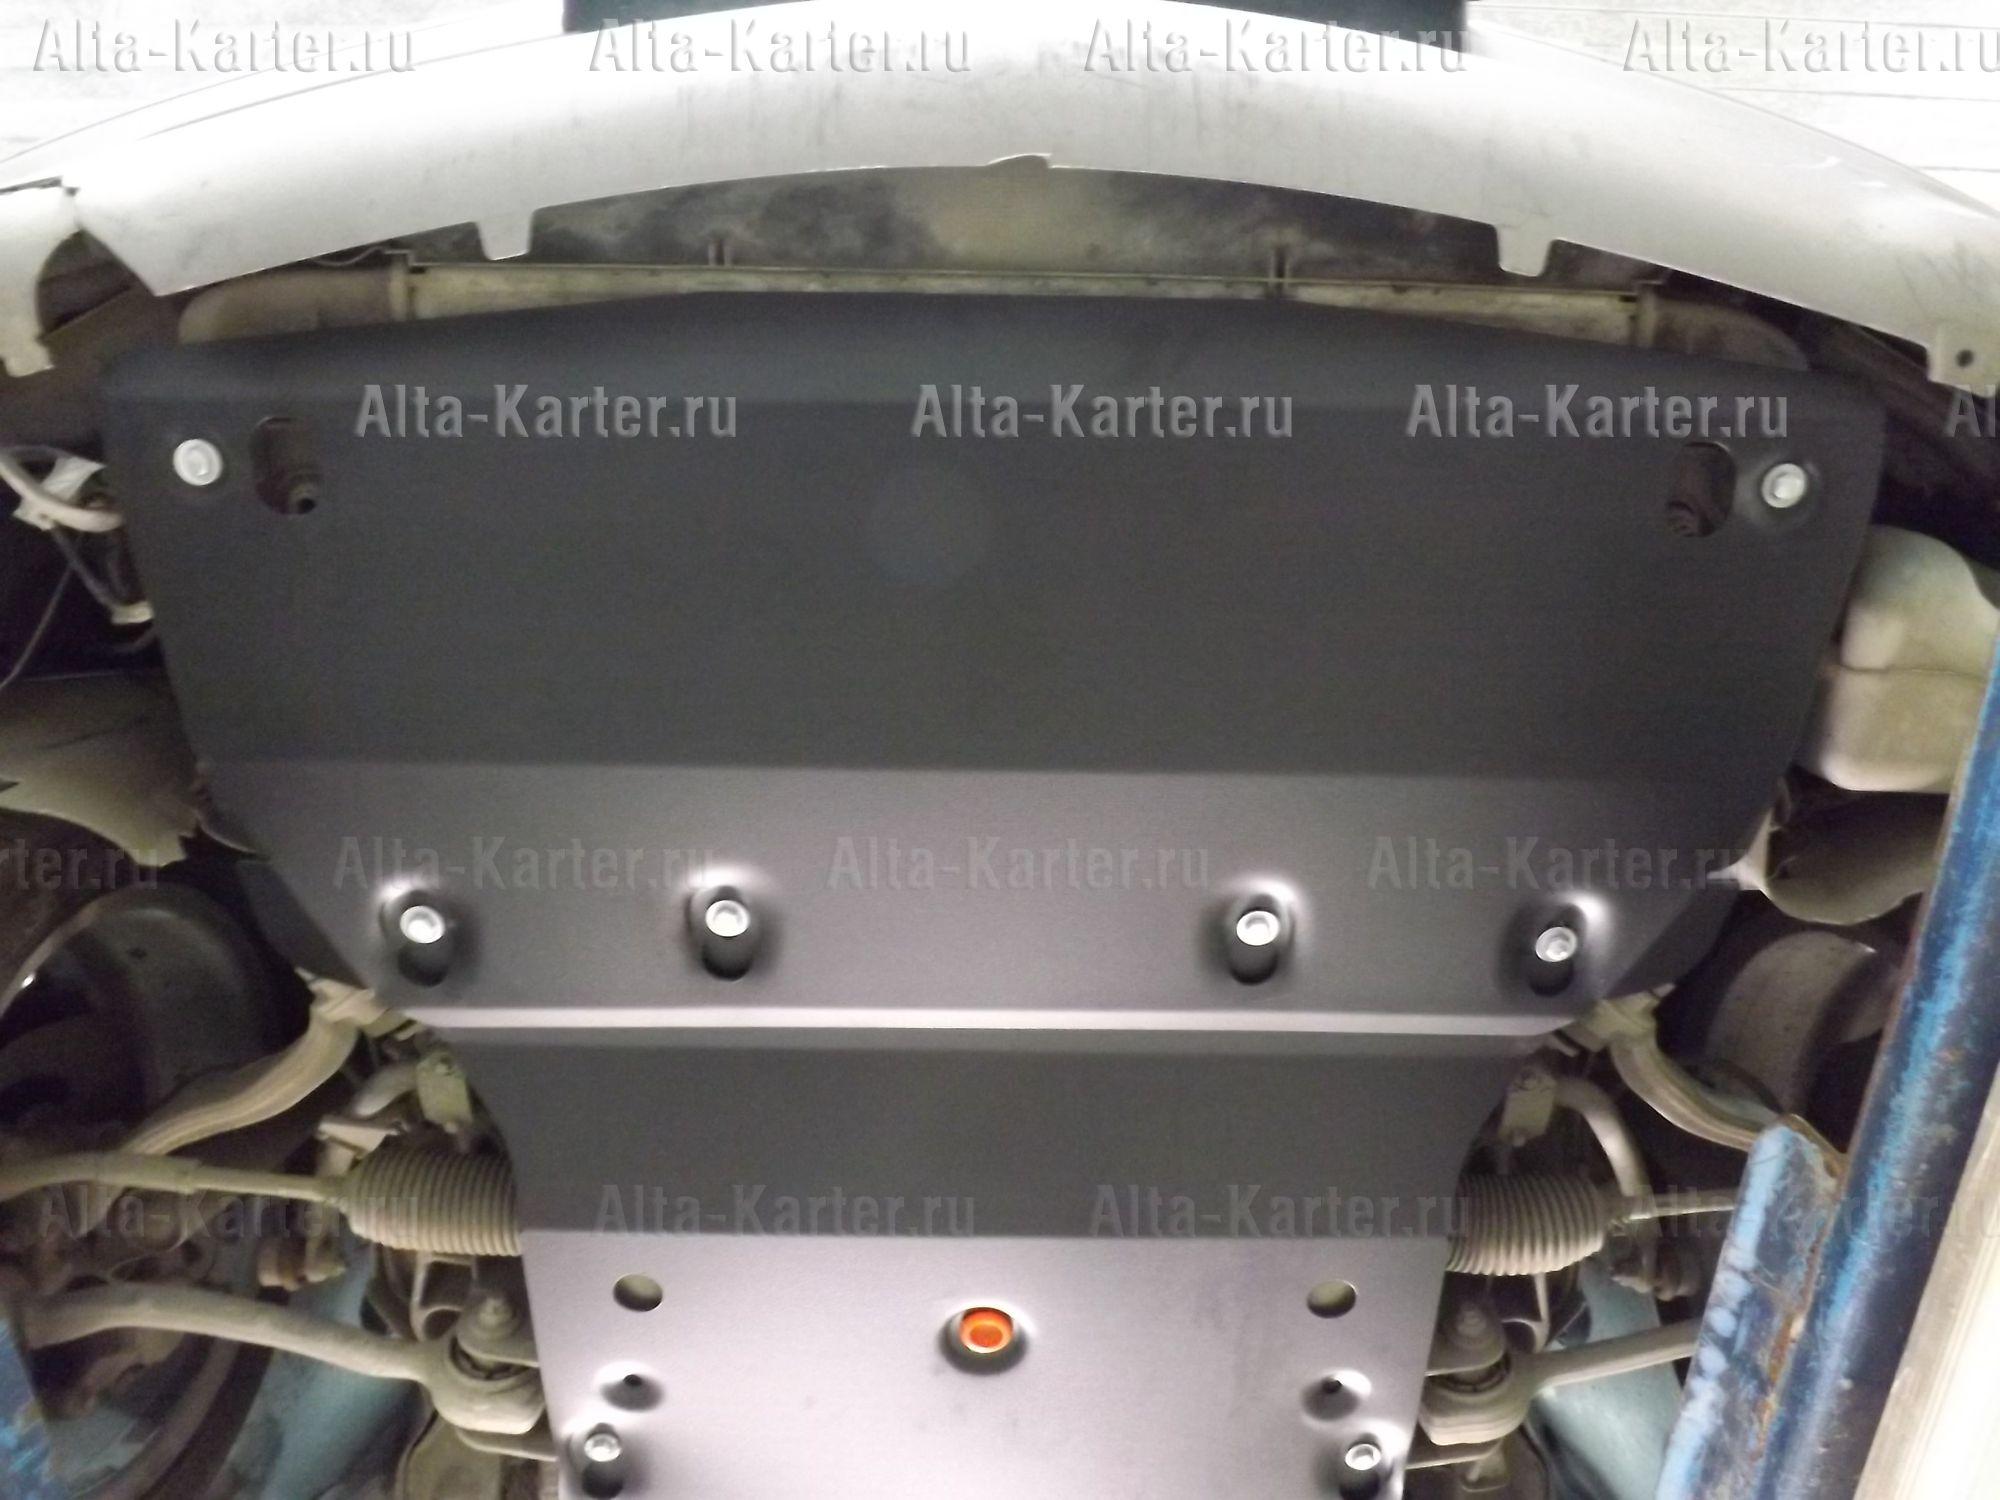 Защита Alfeco для радиатора и картера Mercedes-Benz CLK-Класс W209 до рестайлинга 2002-2005. Артикул ALF.36.17